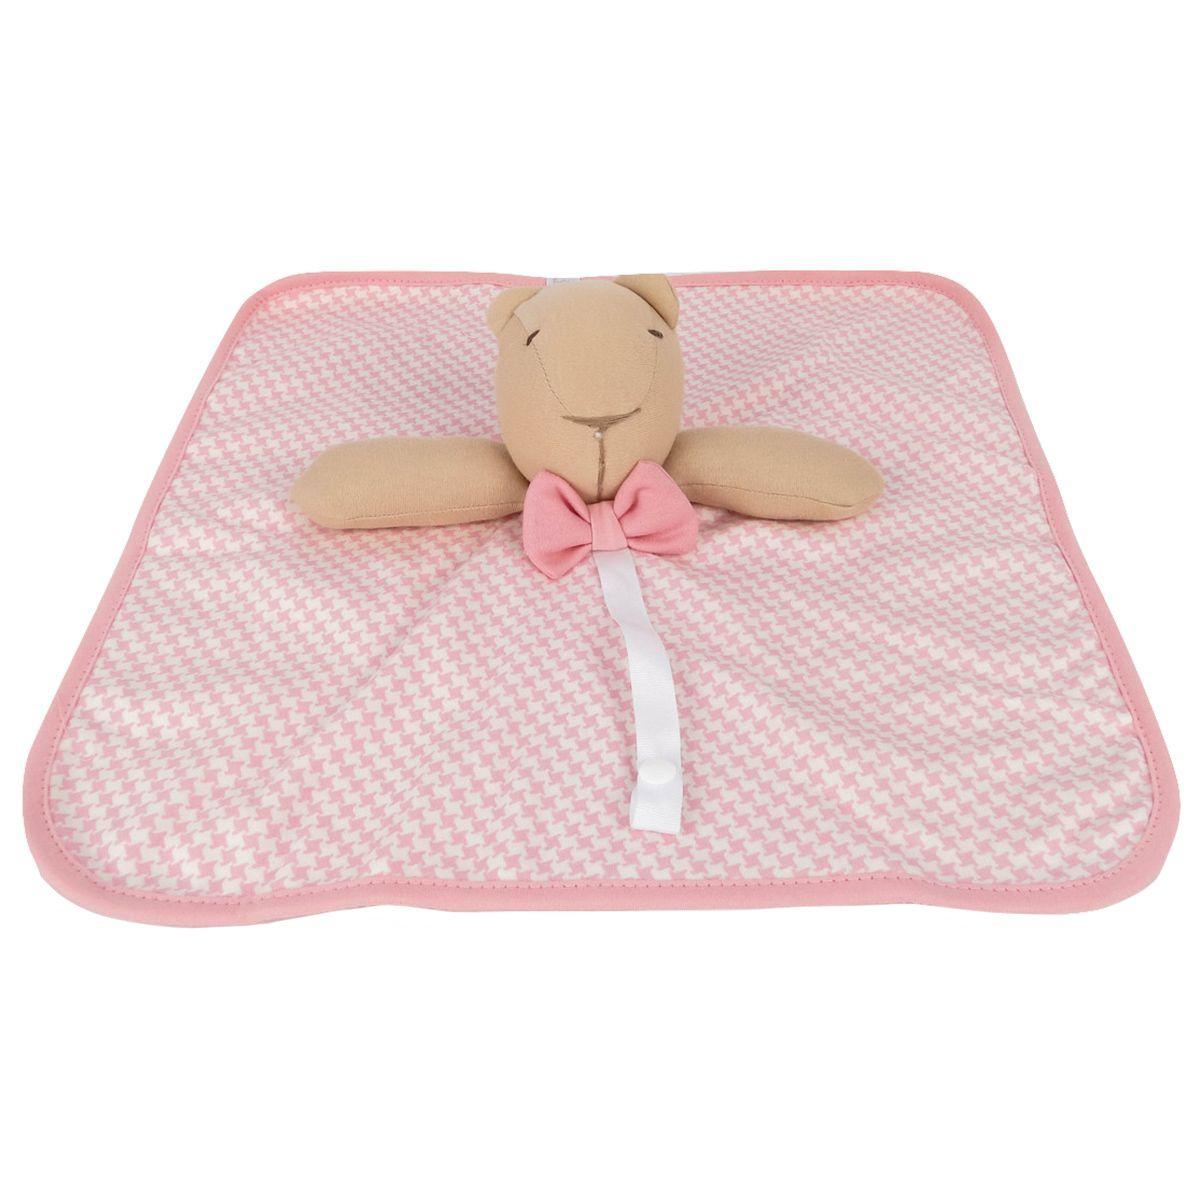 Naninha Hug Baby Pequena Princesa E1408